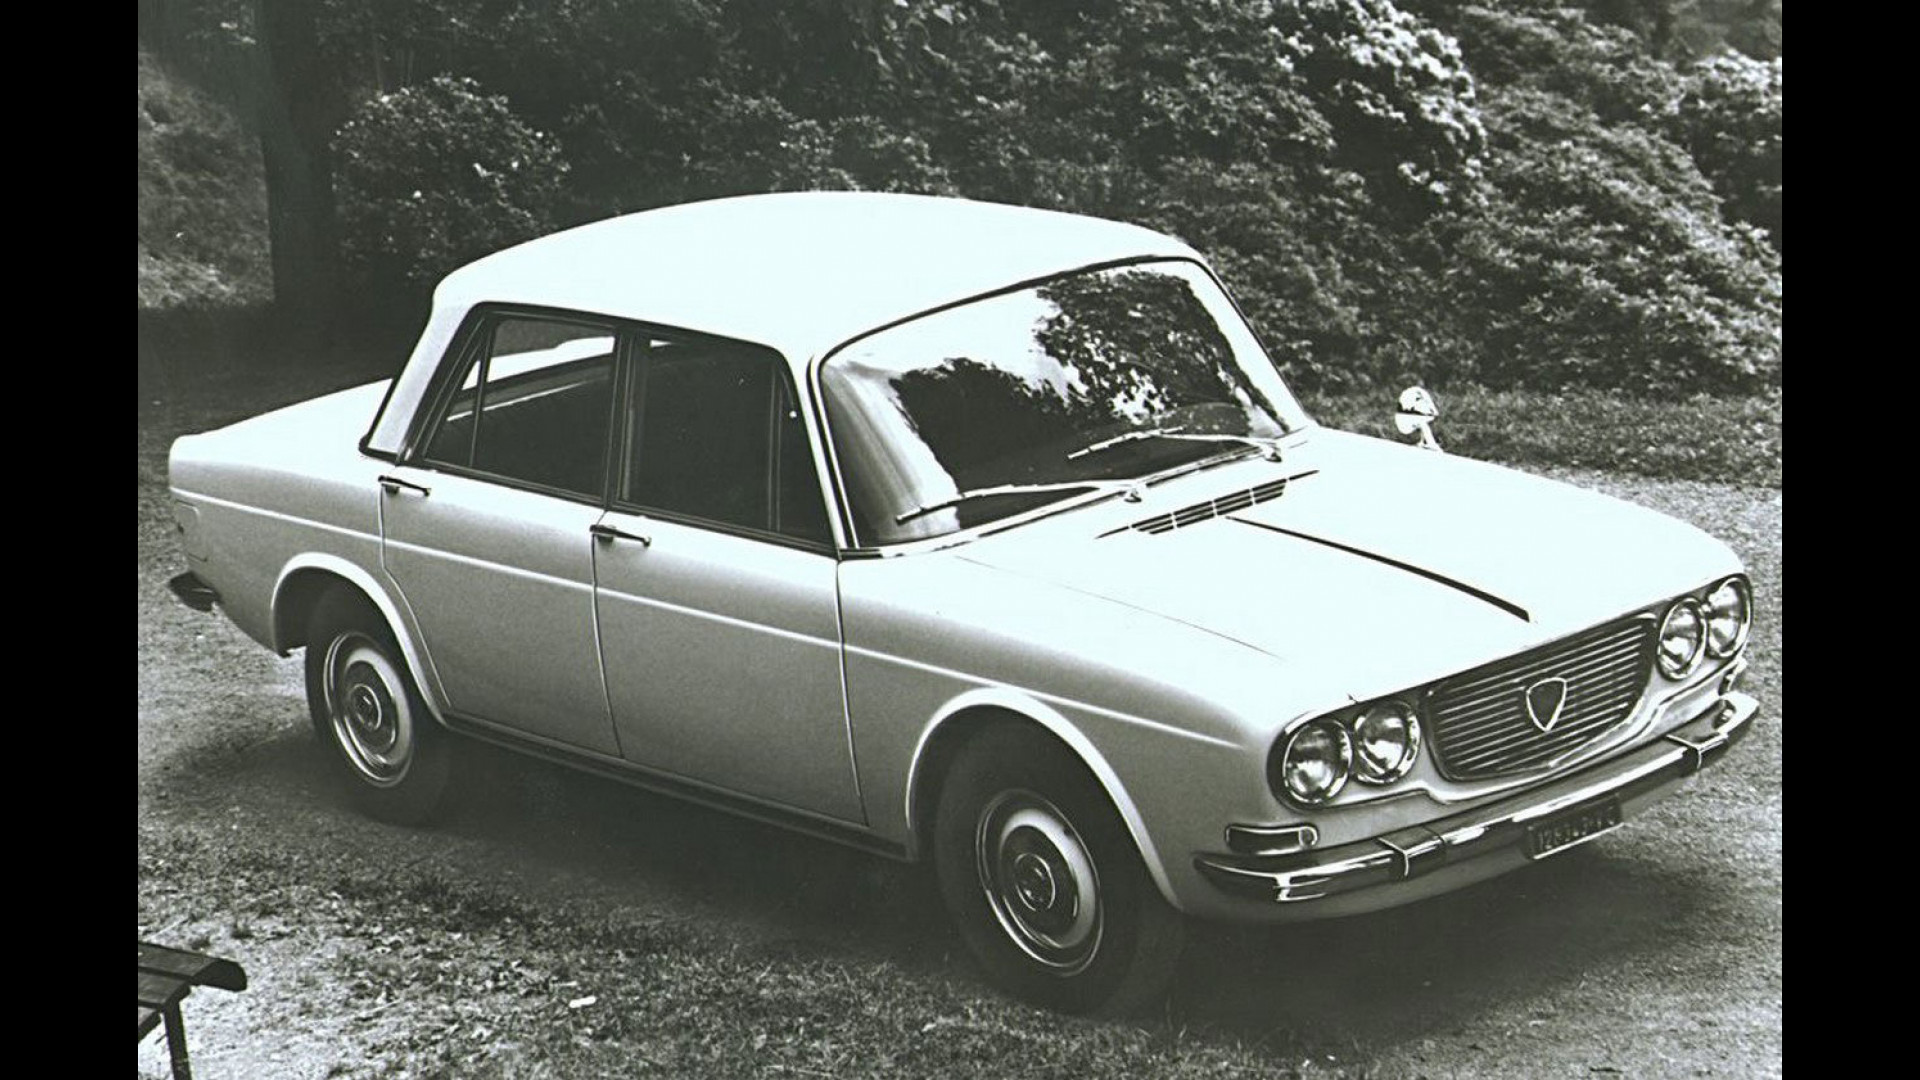 https://icdn-1.motor1.com/images/mgl/Ymgxl/s1/lancia-flavia-tecnica-rivoluzionaria.jpg